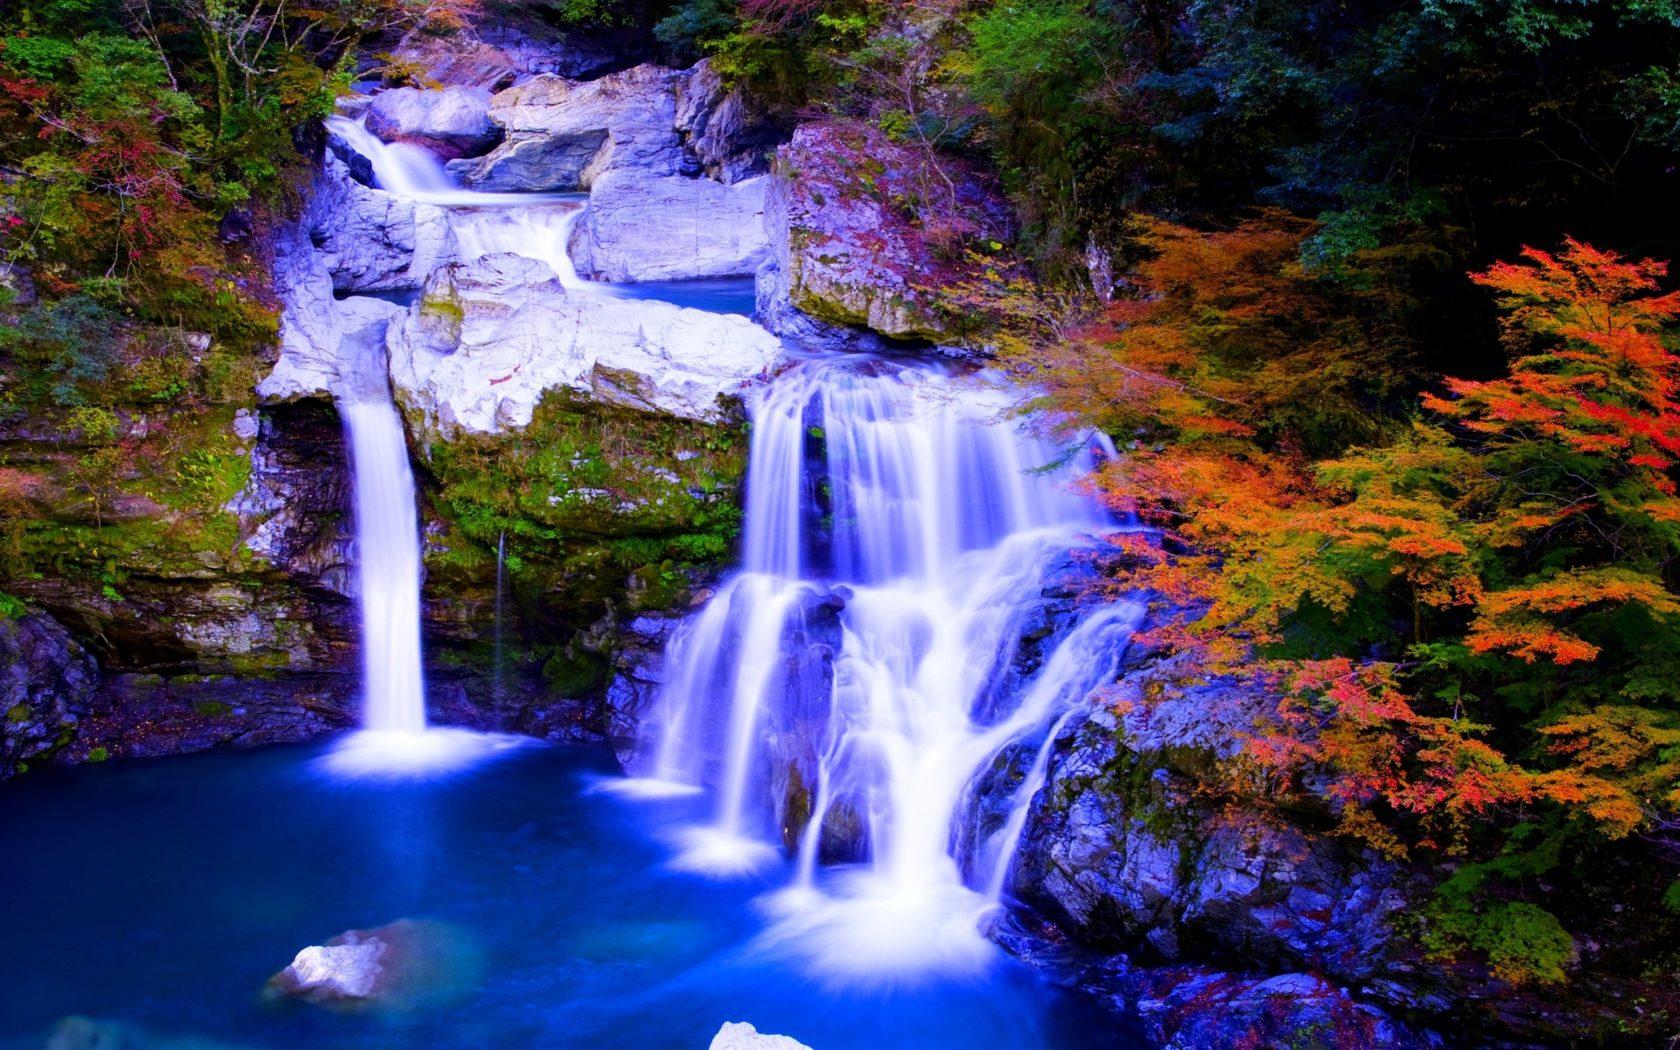 4k Christmas Wallpaper Iphone X Autumn Paradise Nature Foreset Waterfalls Hd Wallpaper